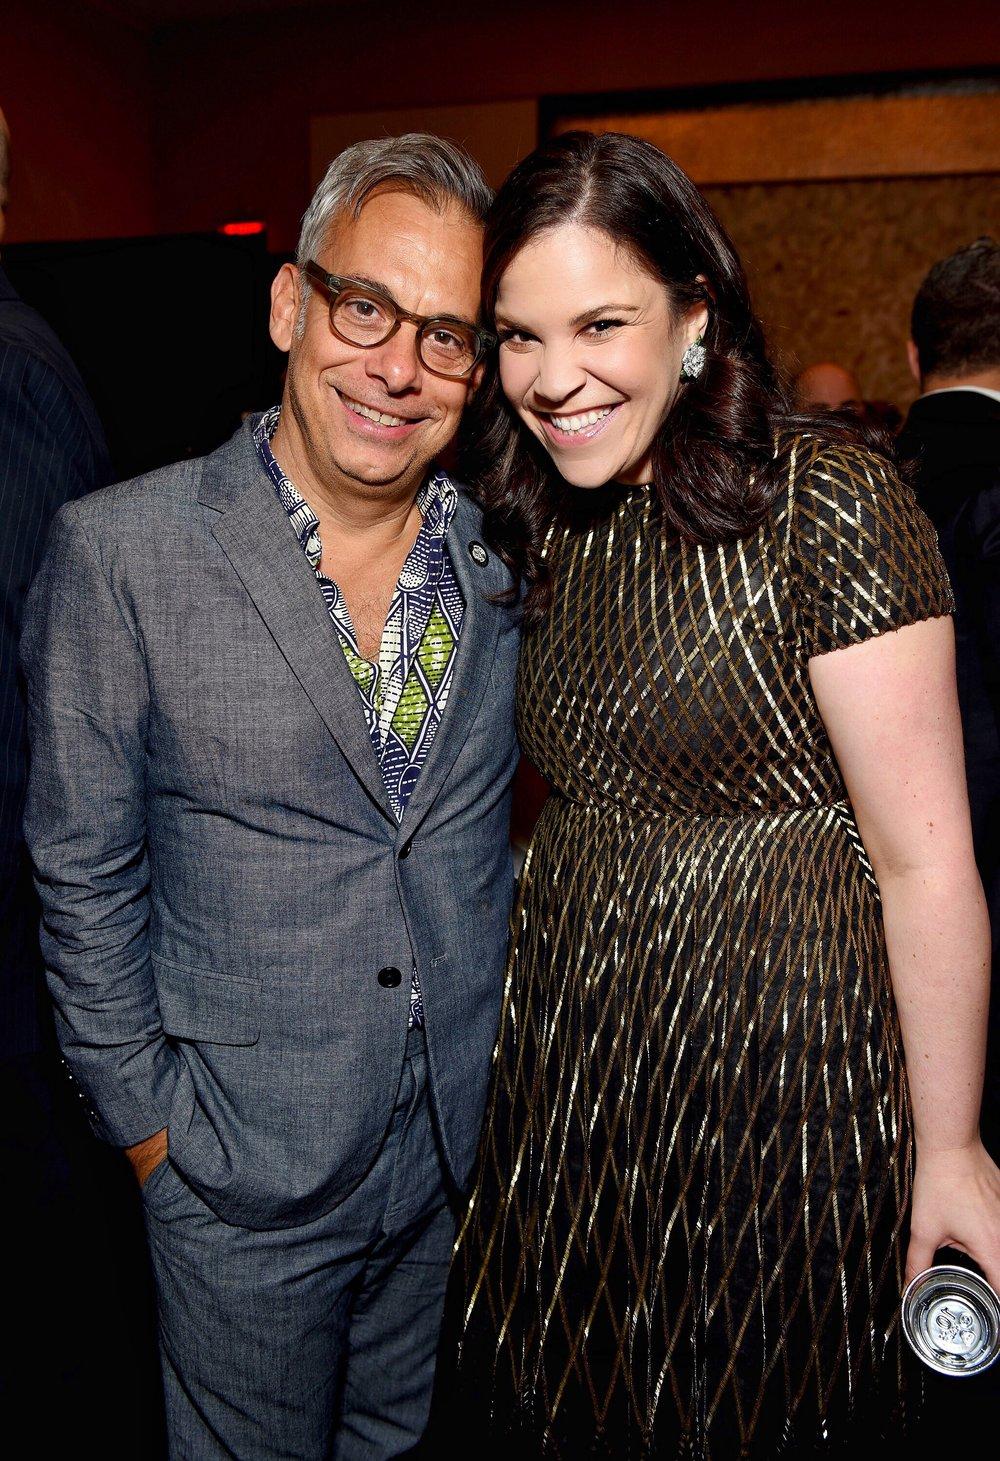 Joe Mantello and Lindsay Mendez at 2018 Tony Award Nominees Press Junket by Jenny Anderson.jpg